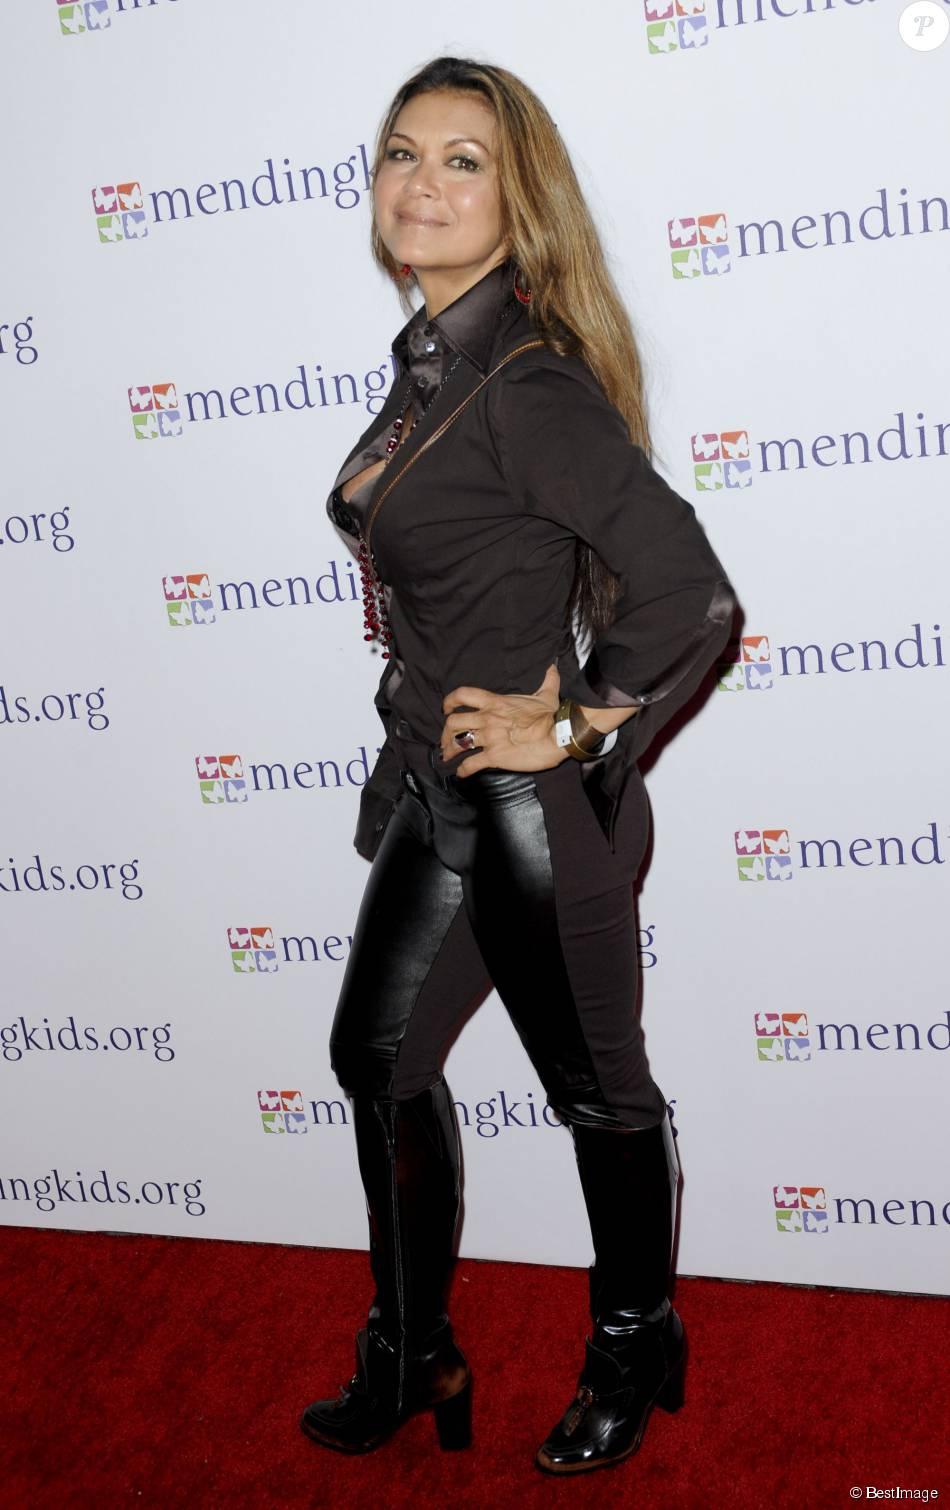 Sienna Guillory (born 1975),Mary-Louise Parker Hot video Ona Munson,Ashwini Kalsekar